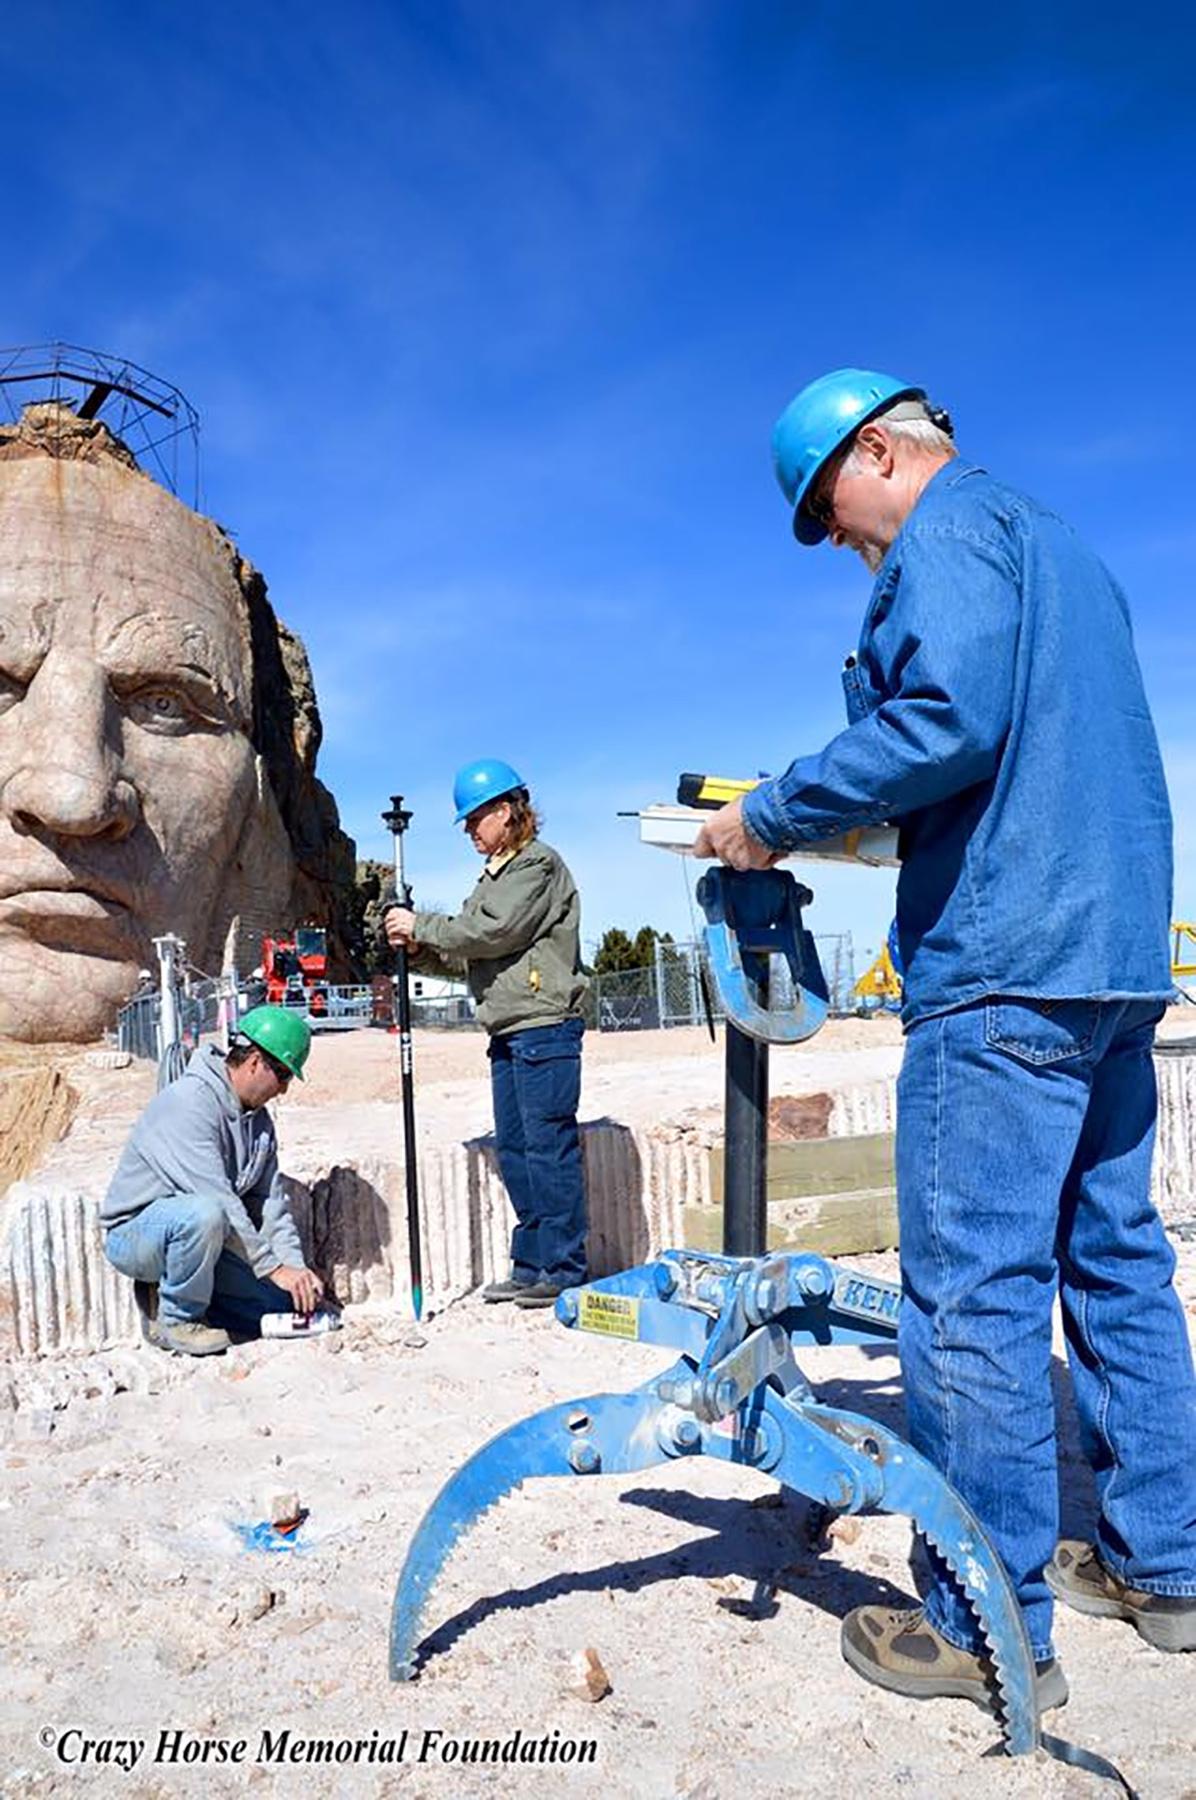 Closeup View of Kenco Rocklift atop Crazy Horse